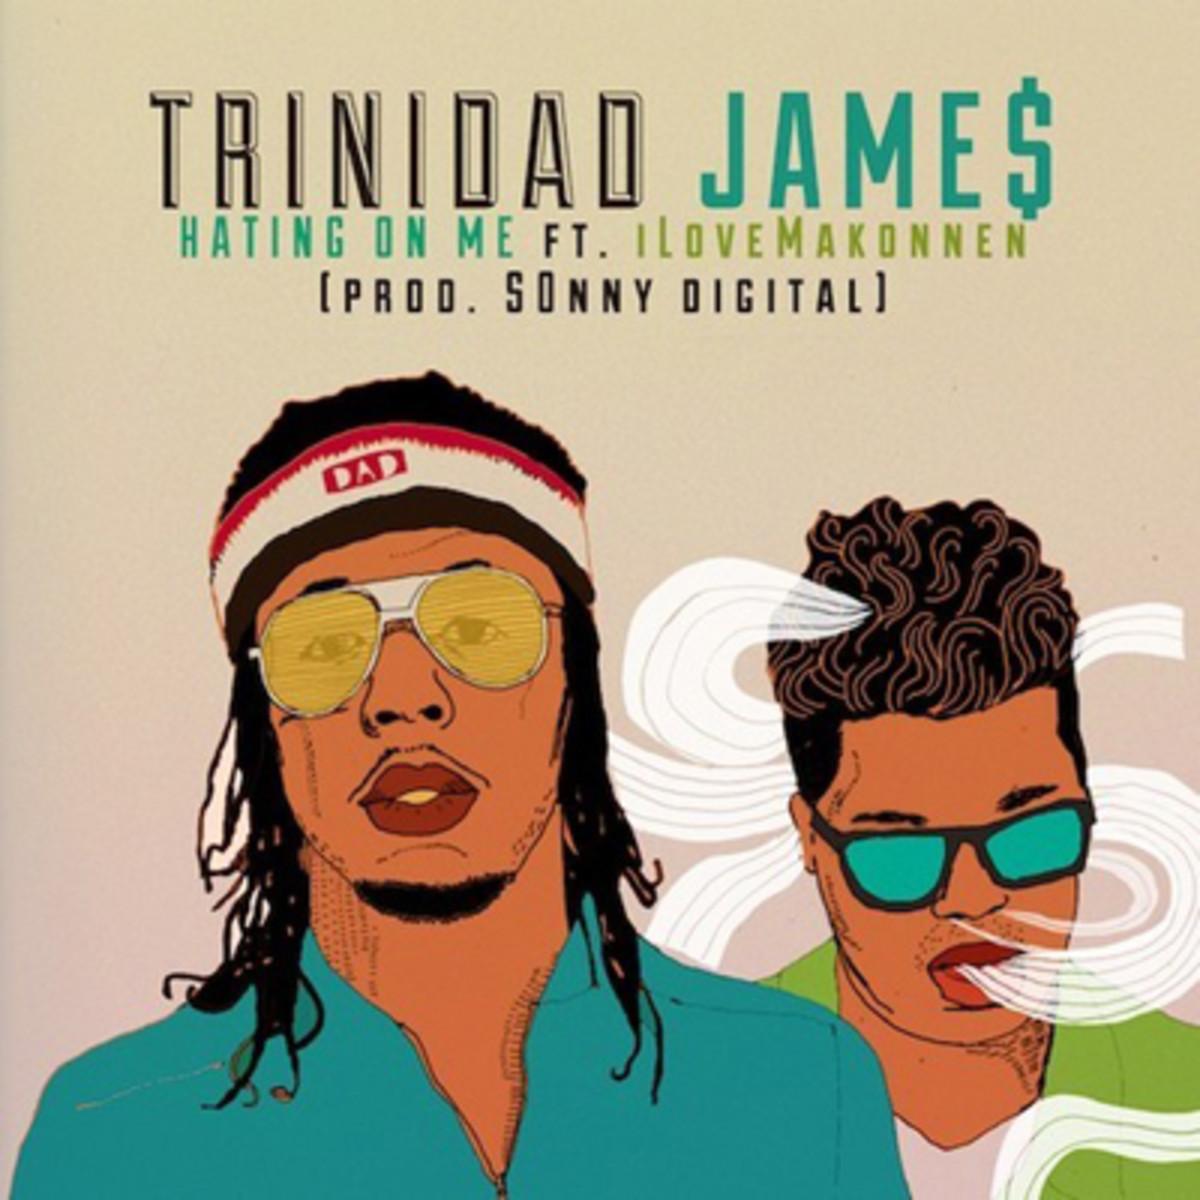 trinidadjames-hatingonme.jpg